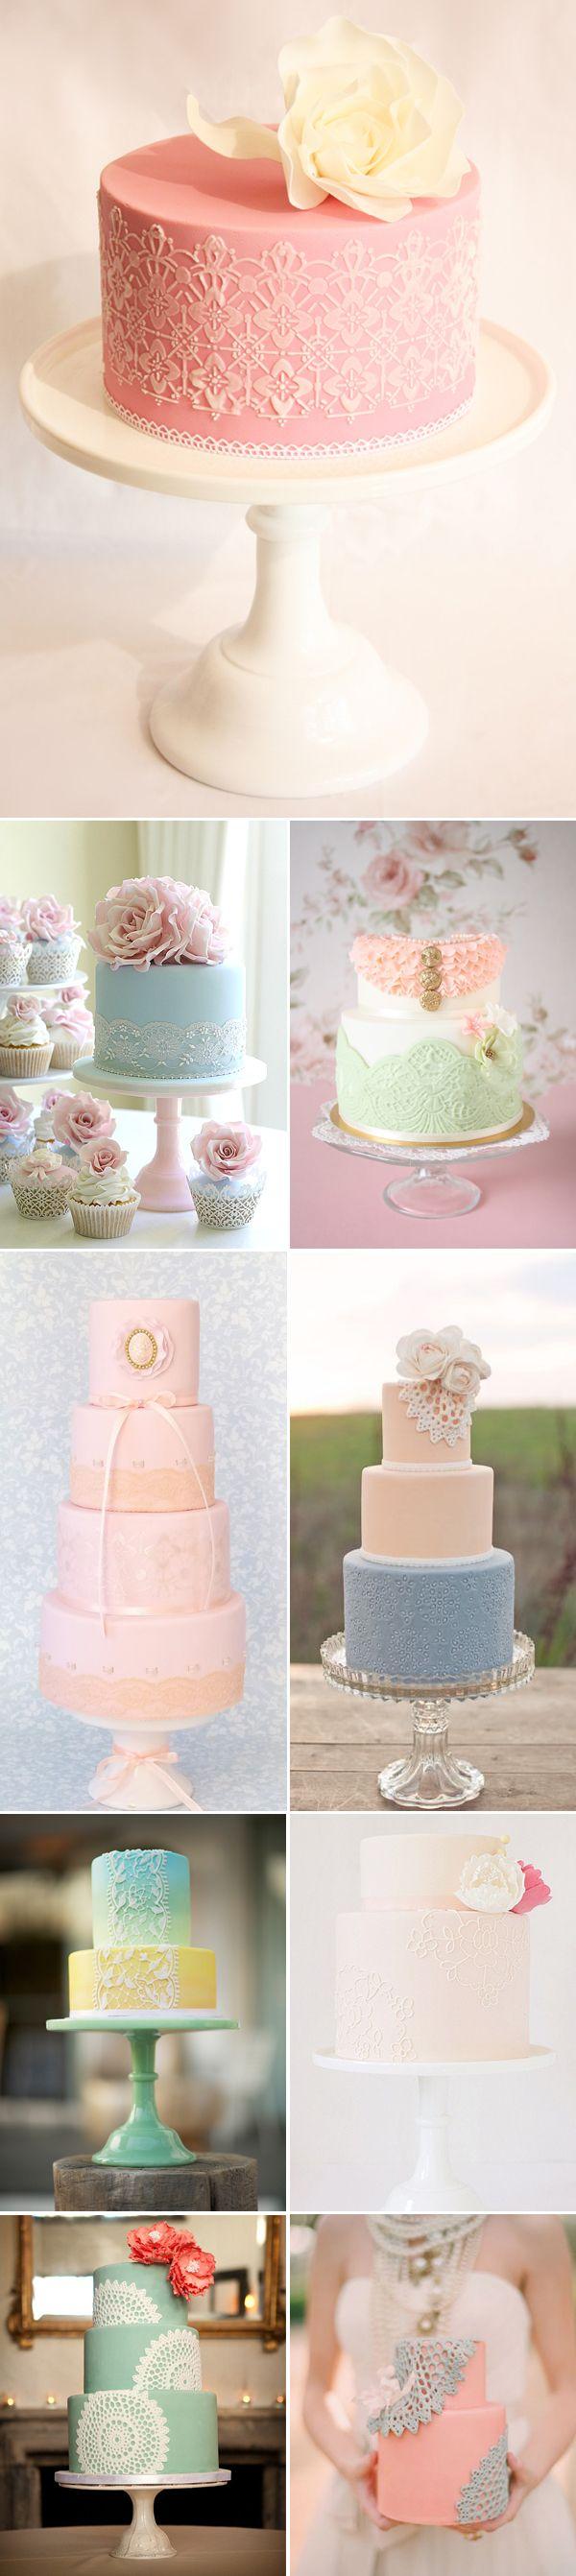 15 Romantic Laced Cakes - http://www.praisewedding.com/archives/2350